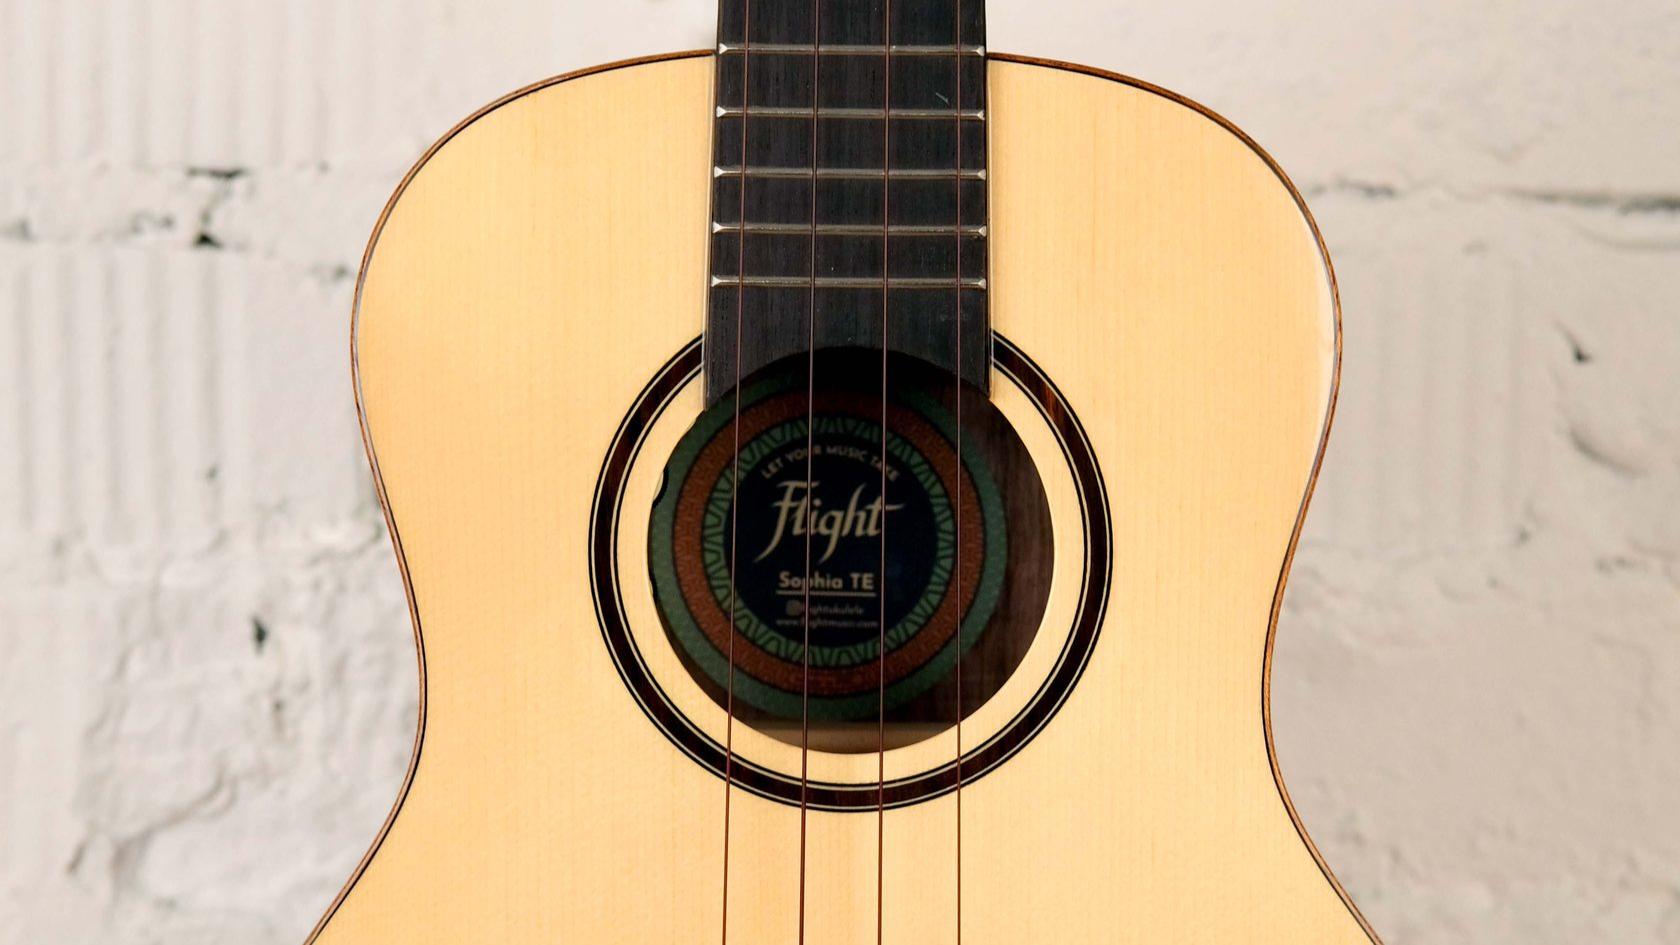 купить укулеле тенор Flight Sophia со звукоснимателем и фирменным чехлом в комплекте в магазине укулеле Ukelovers, электроакустическая укулеле, ukulele tenor